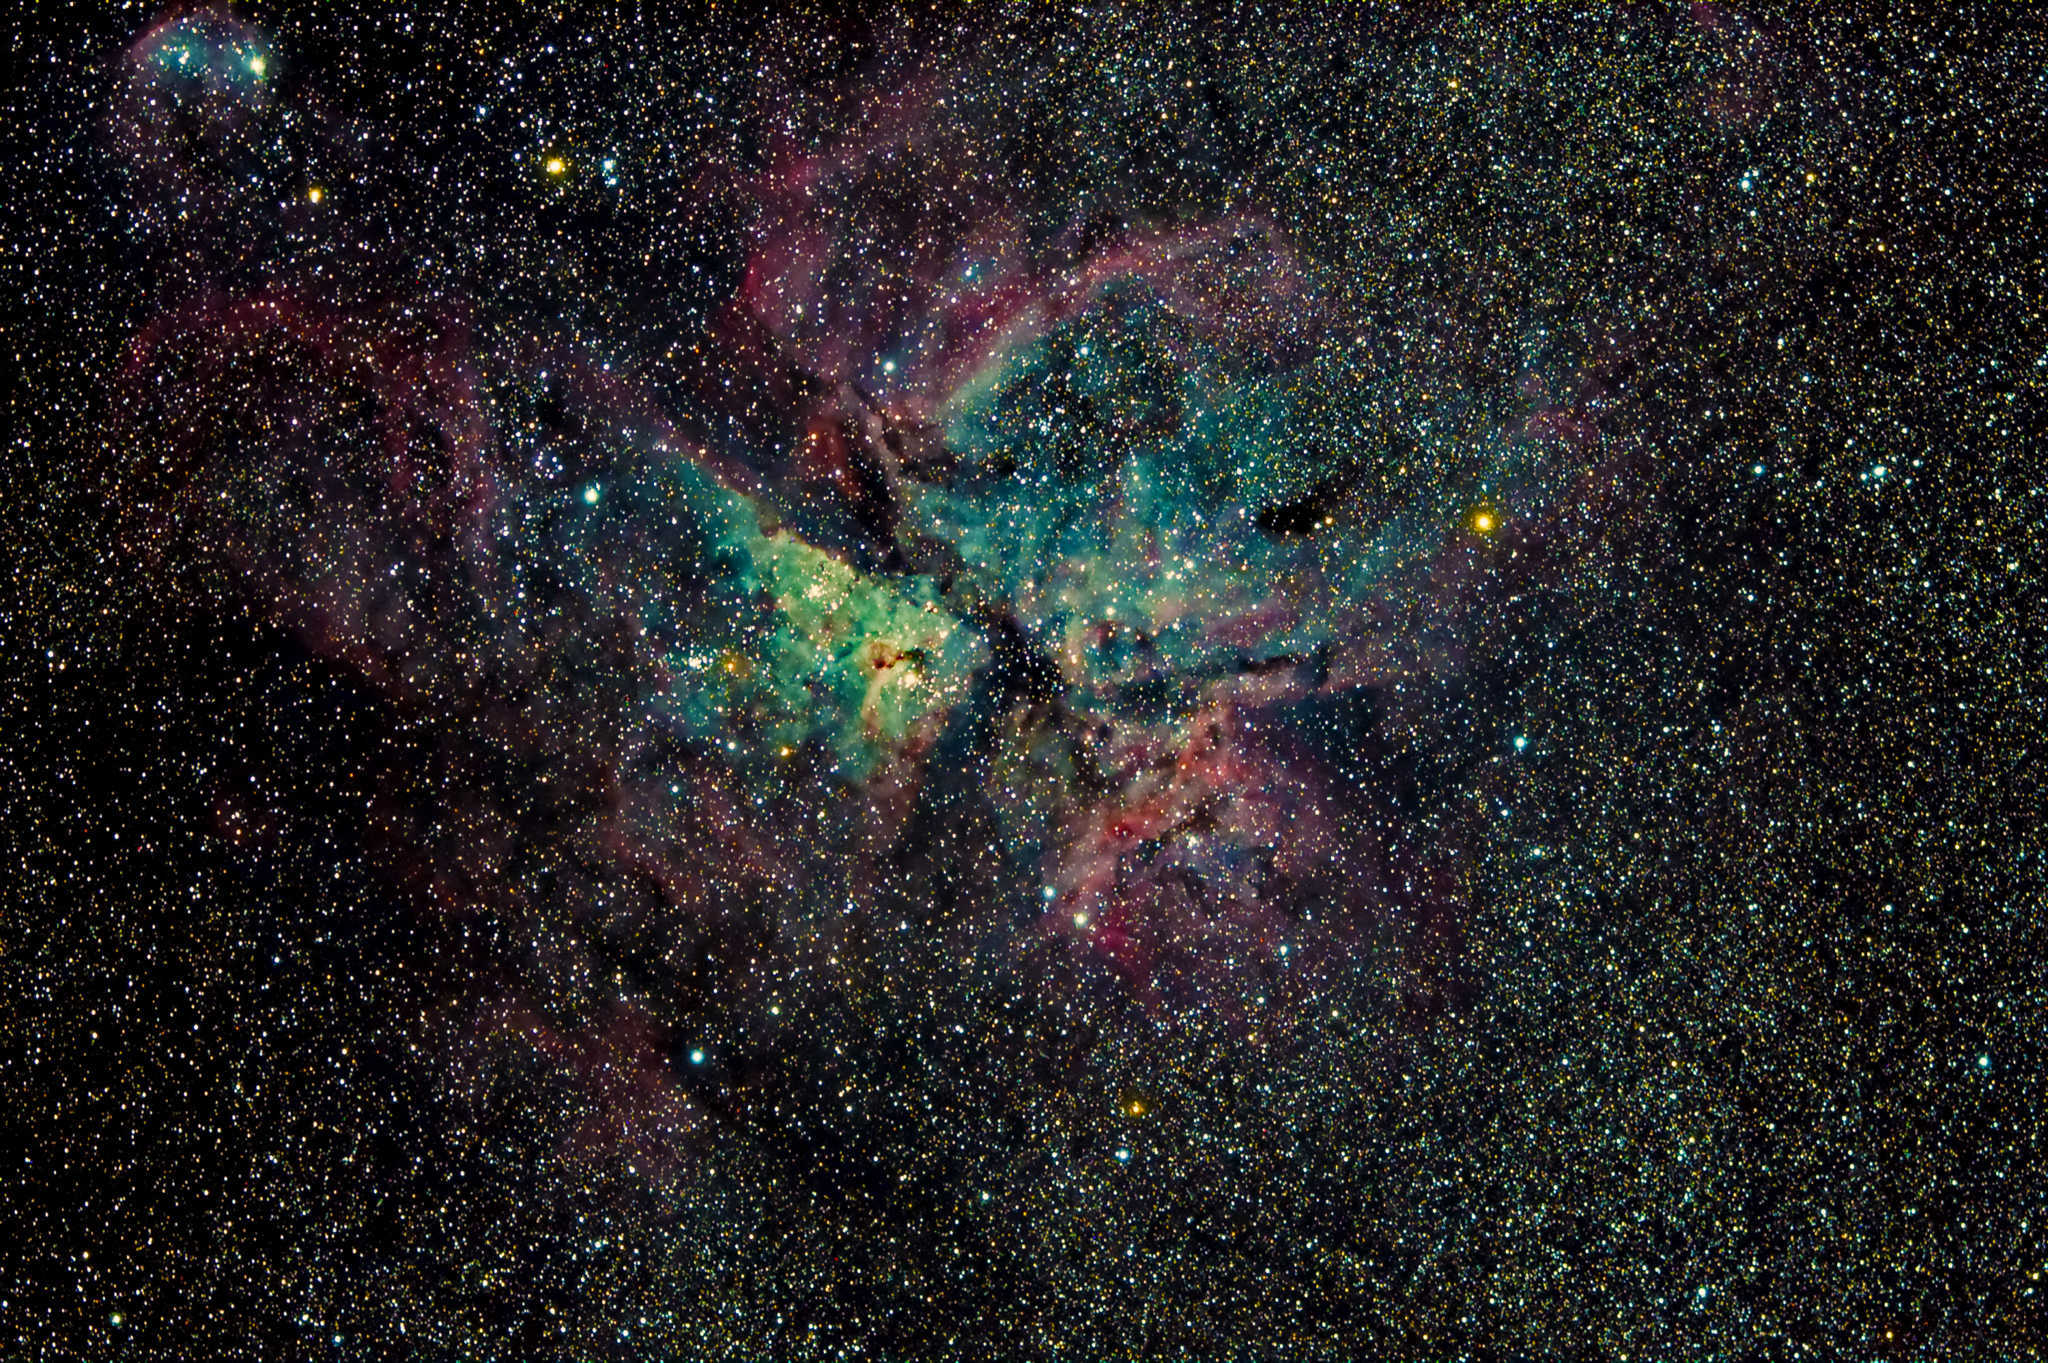 The Carina nebula - a southern sky jewel! #astrophotography via Daniel Nicolae